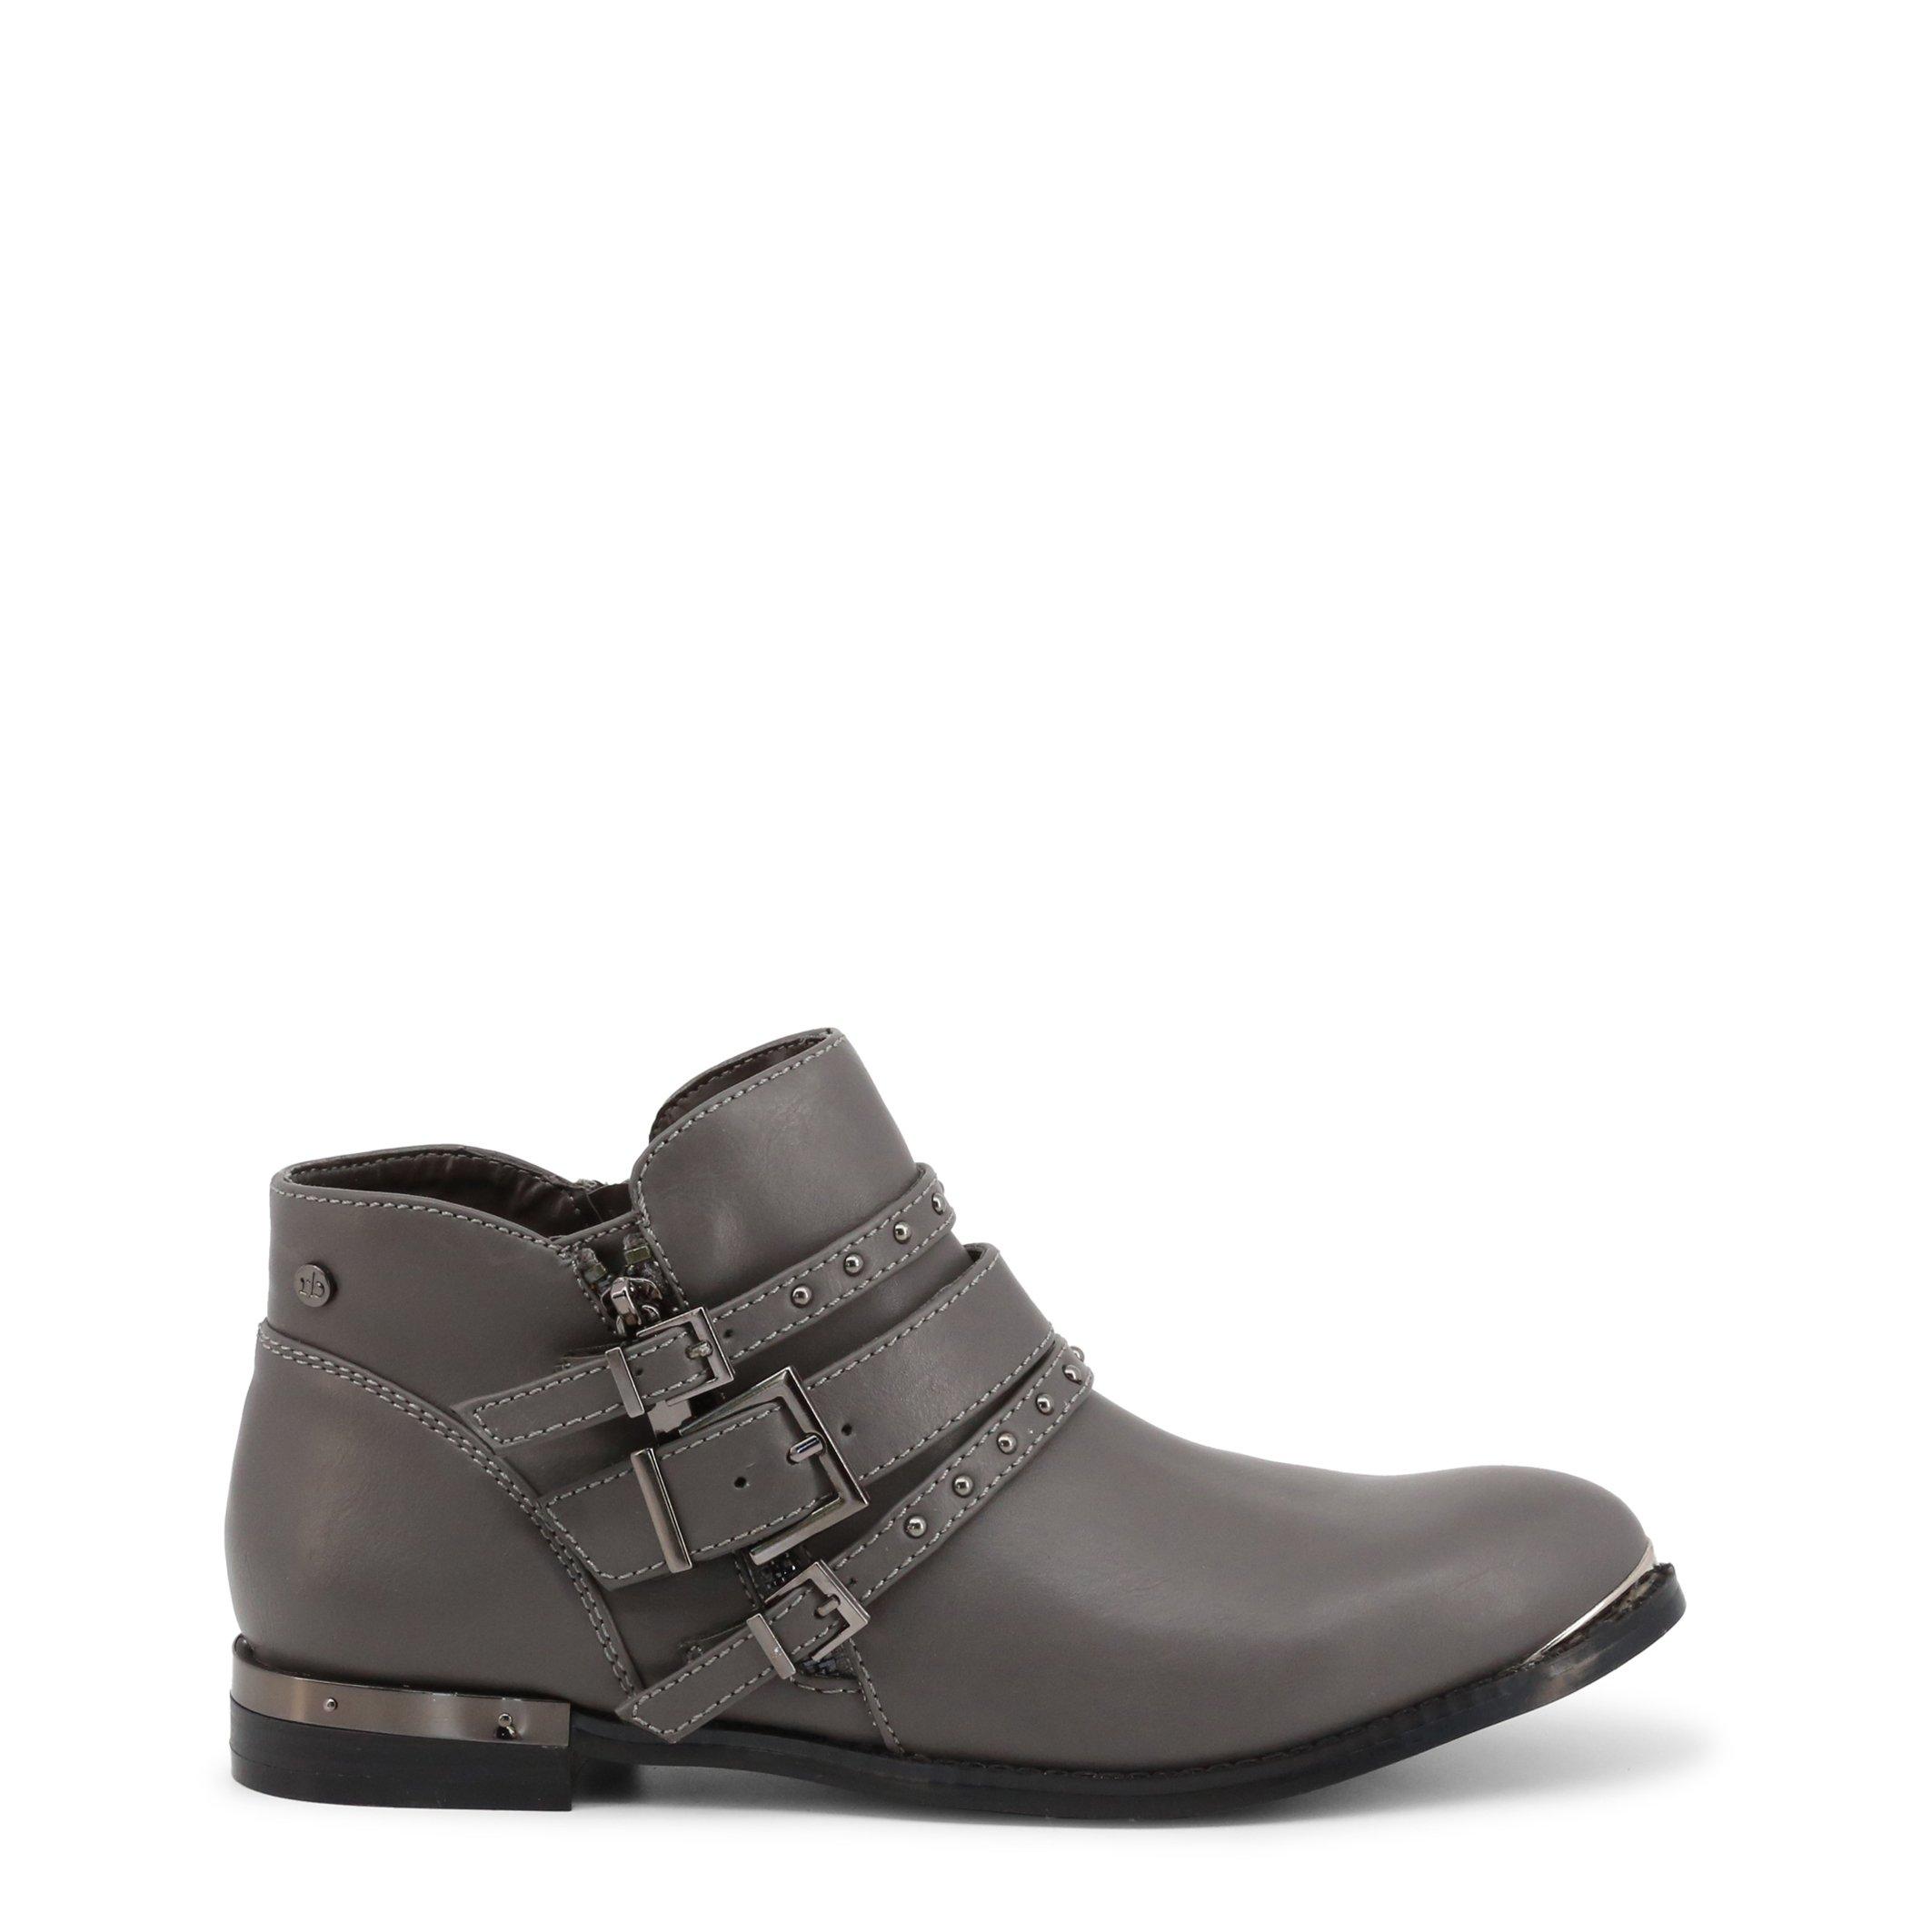 Roccobarocco Women's Ankle Boot Black RBSC0U102 - grey EU 35